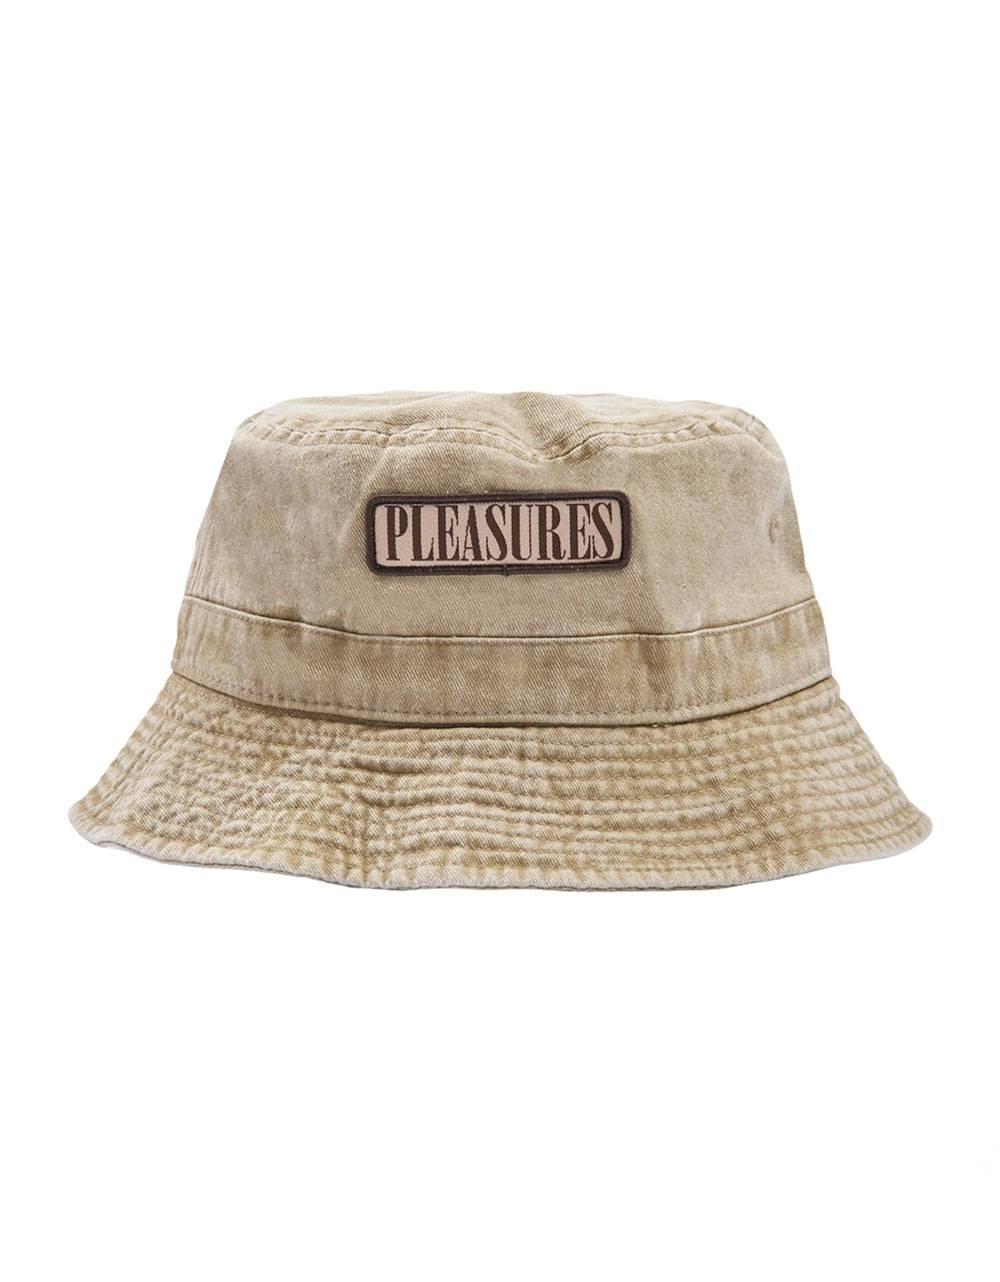 Pleasures Spank bucket hat - washed khaki Pleasures Hat 45,08€